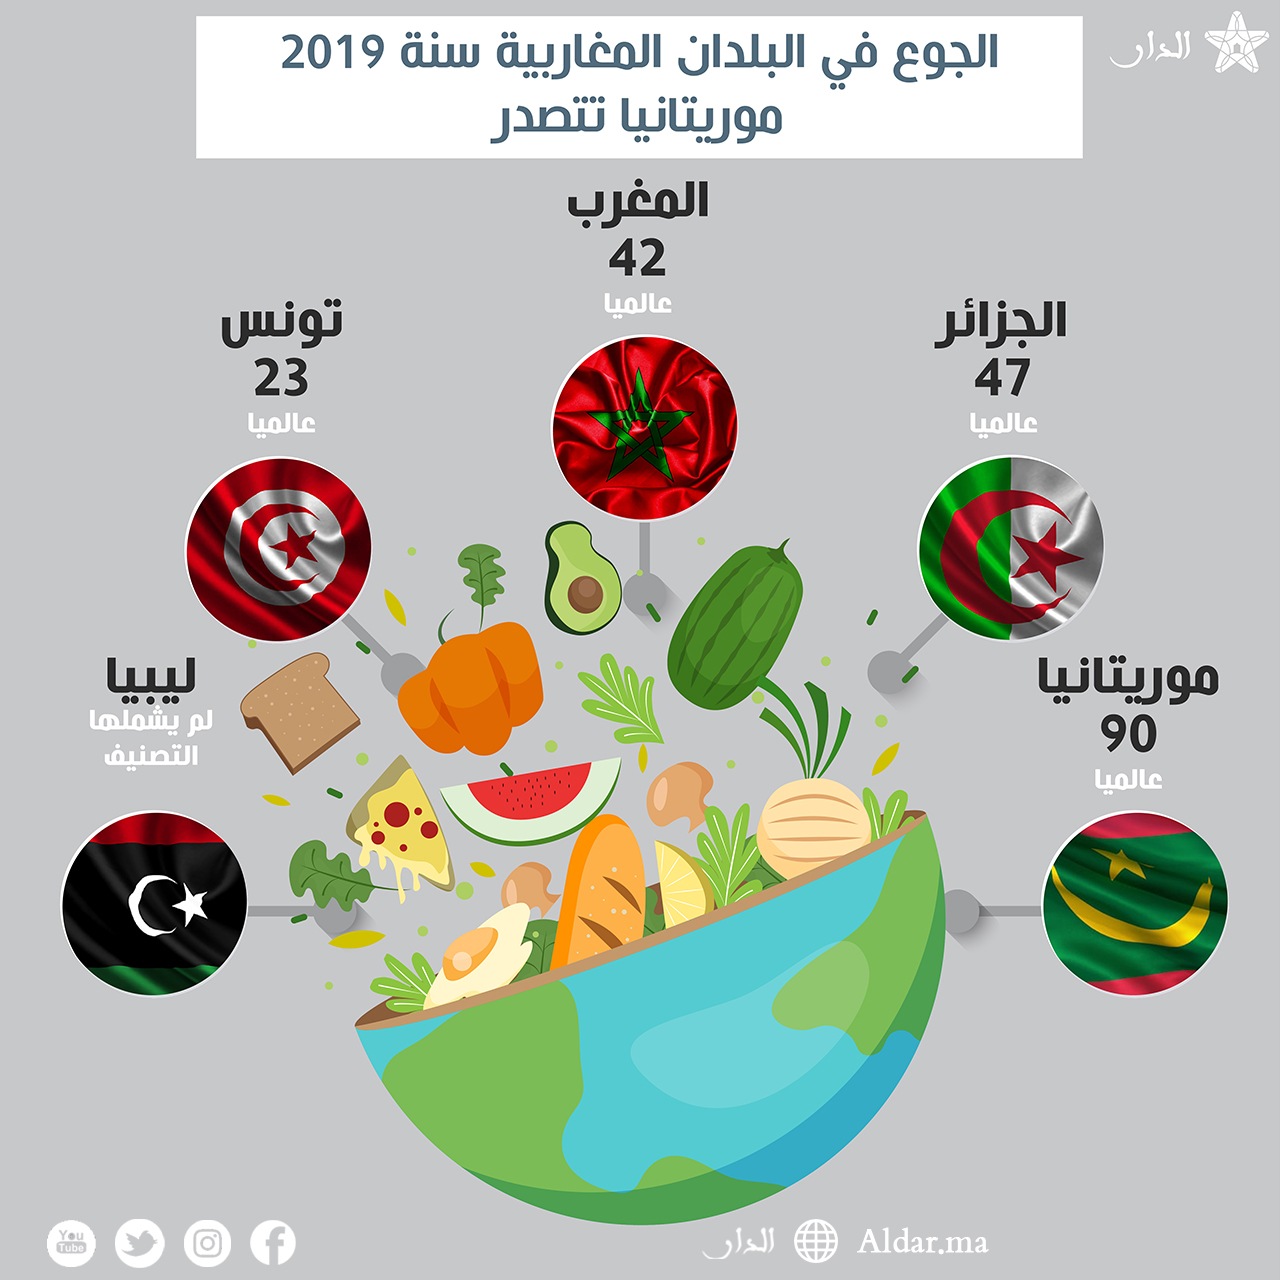 Photo of الجوع في البلدان المغاربية سنة 2019 موريتانيا تتصدر